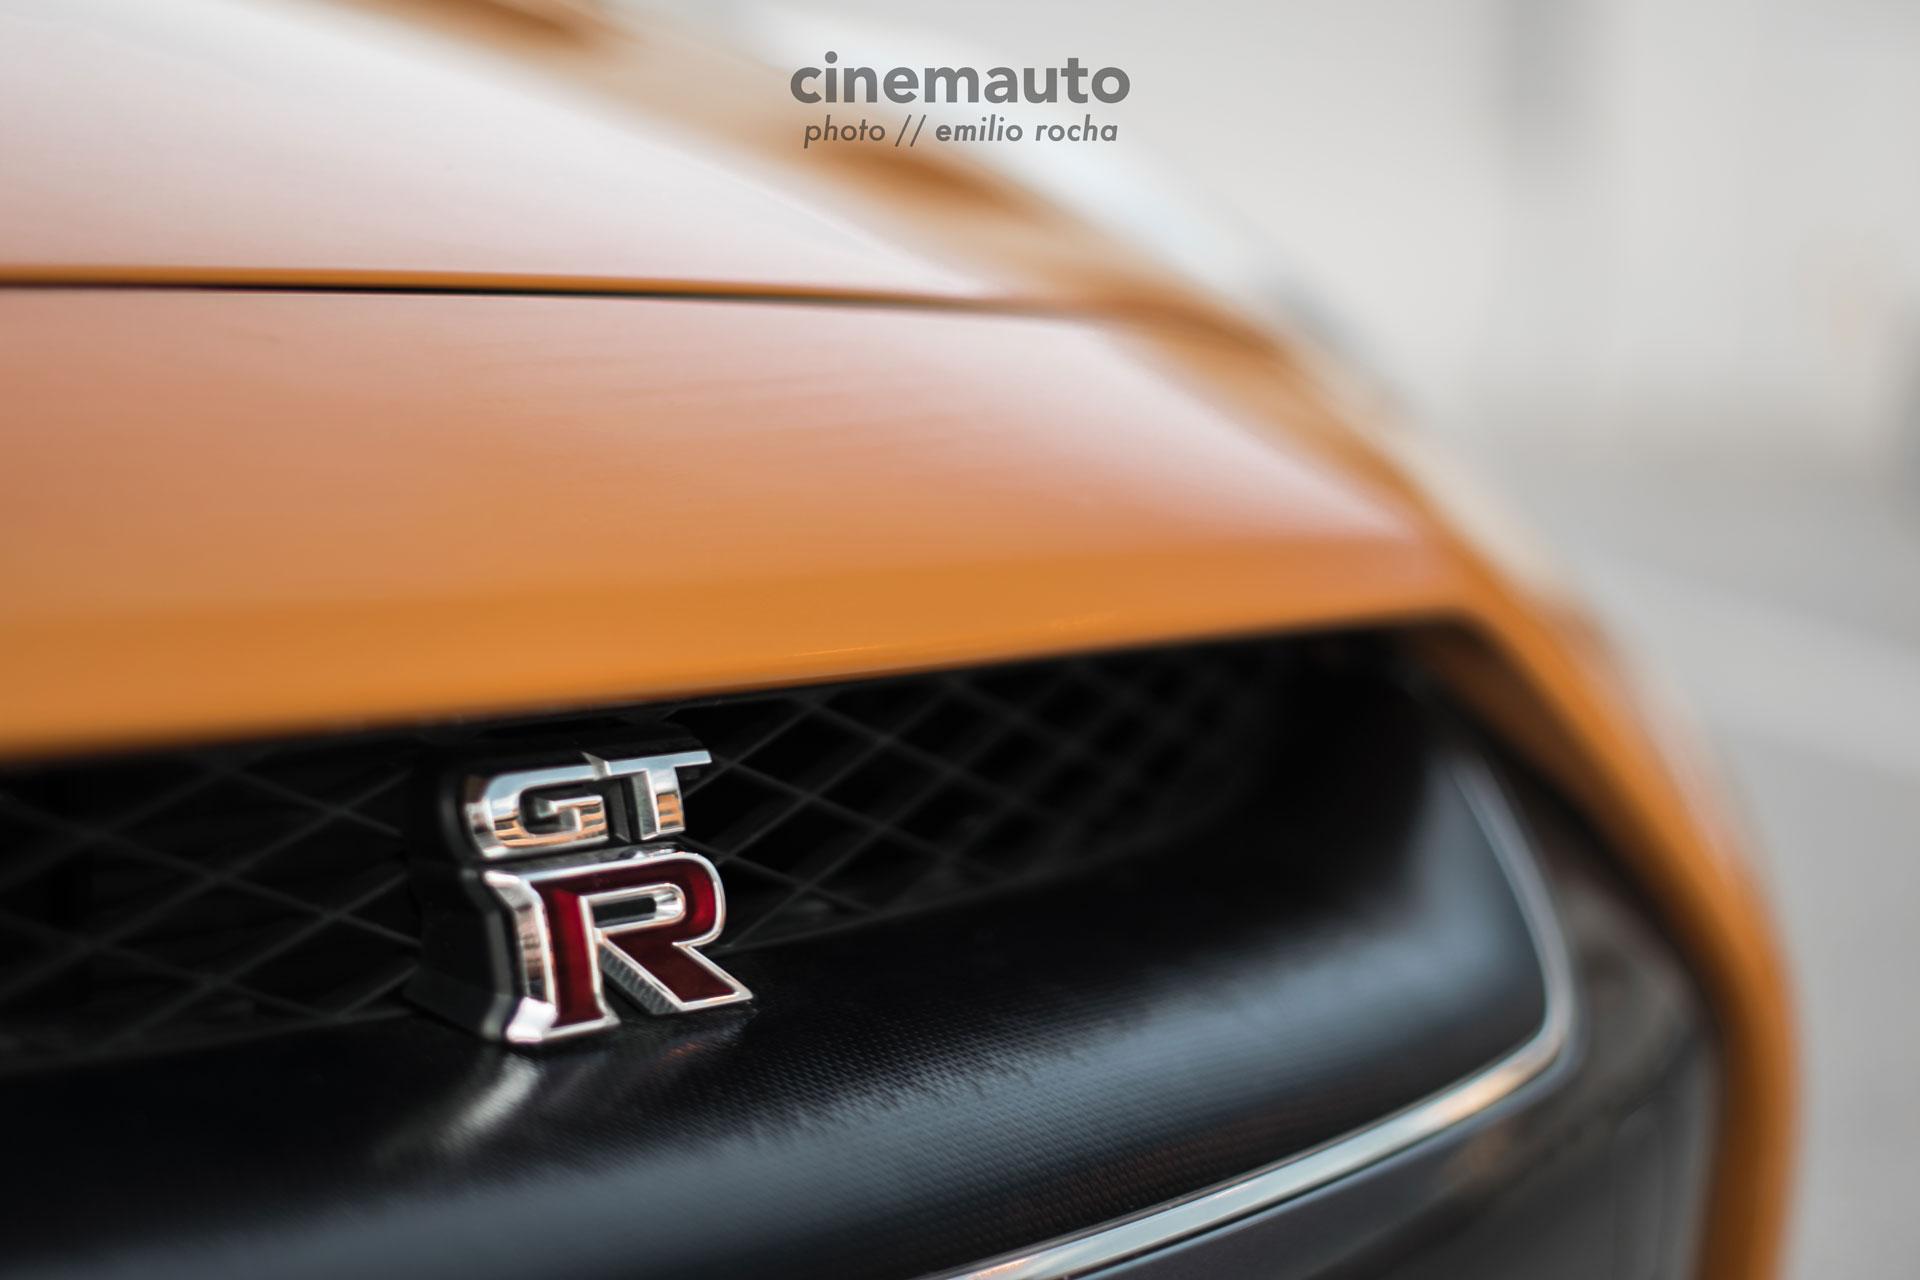 cinemauto-kansas-automotive-photography-er3.jpg